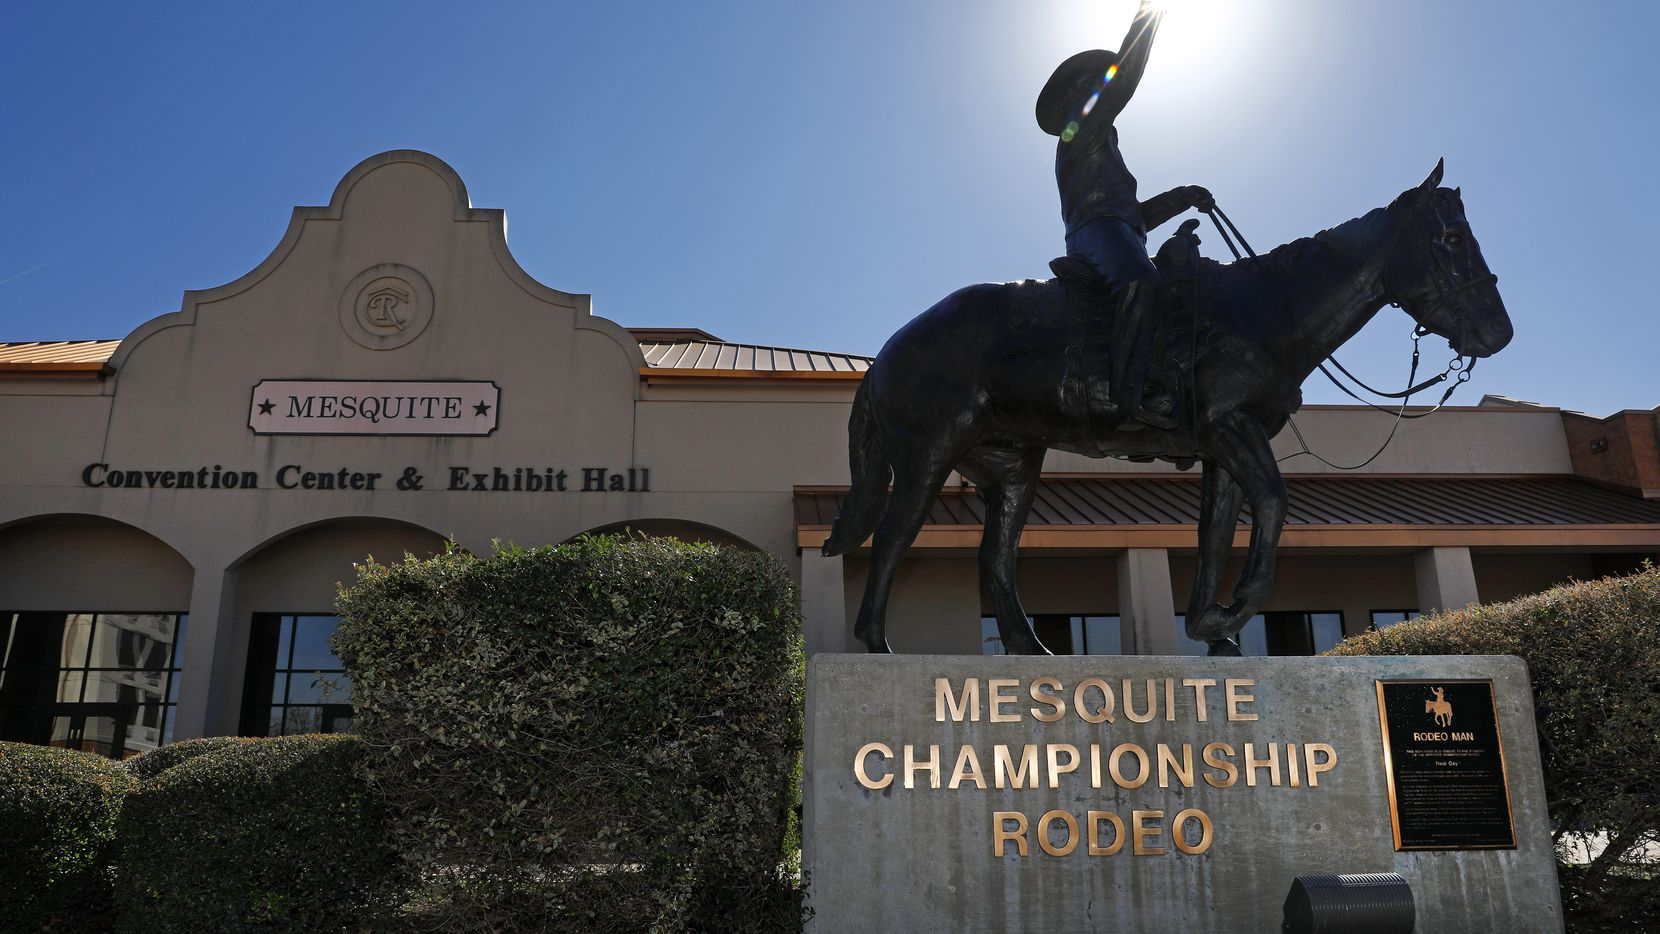 Mesquite rodeo convention center